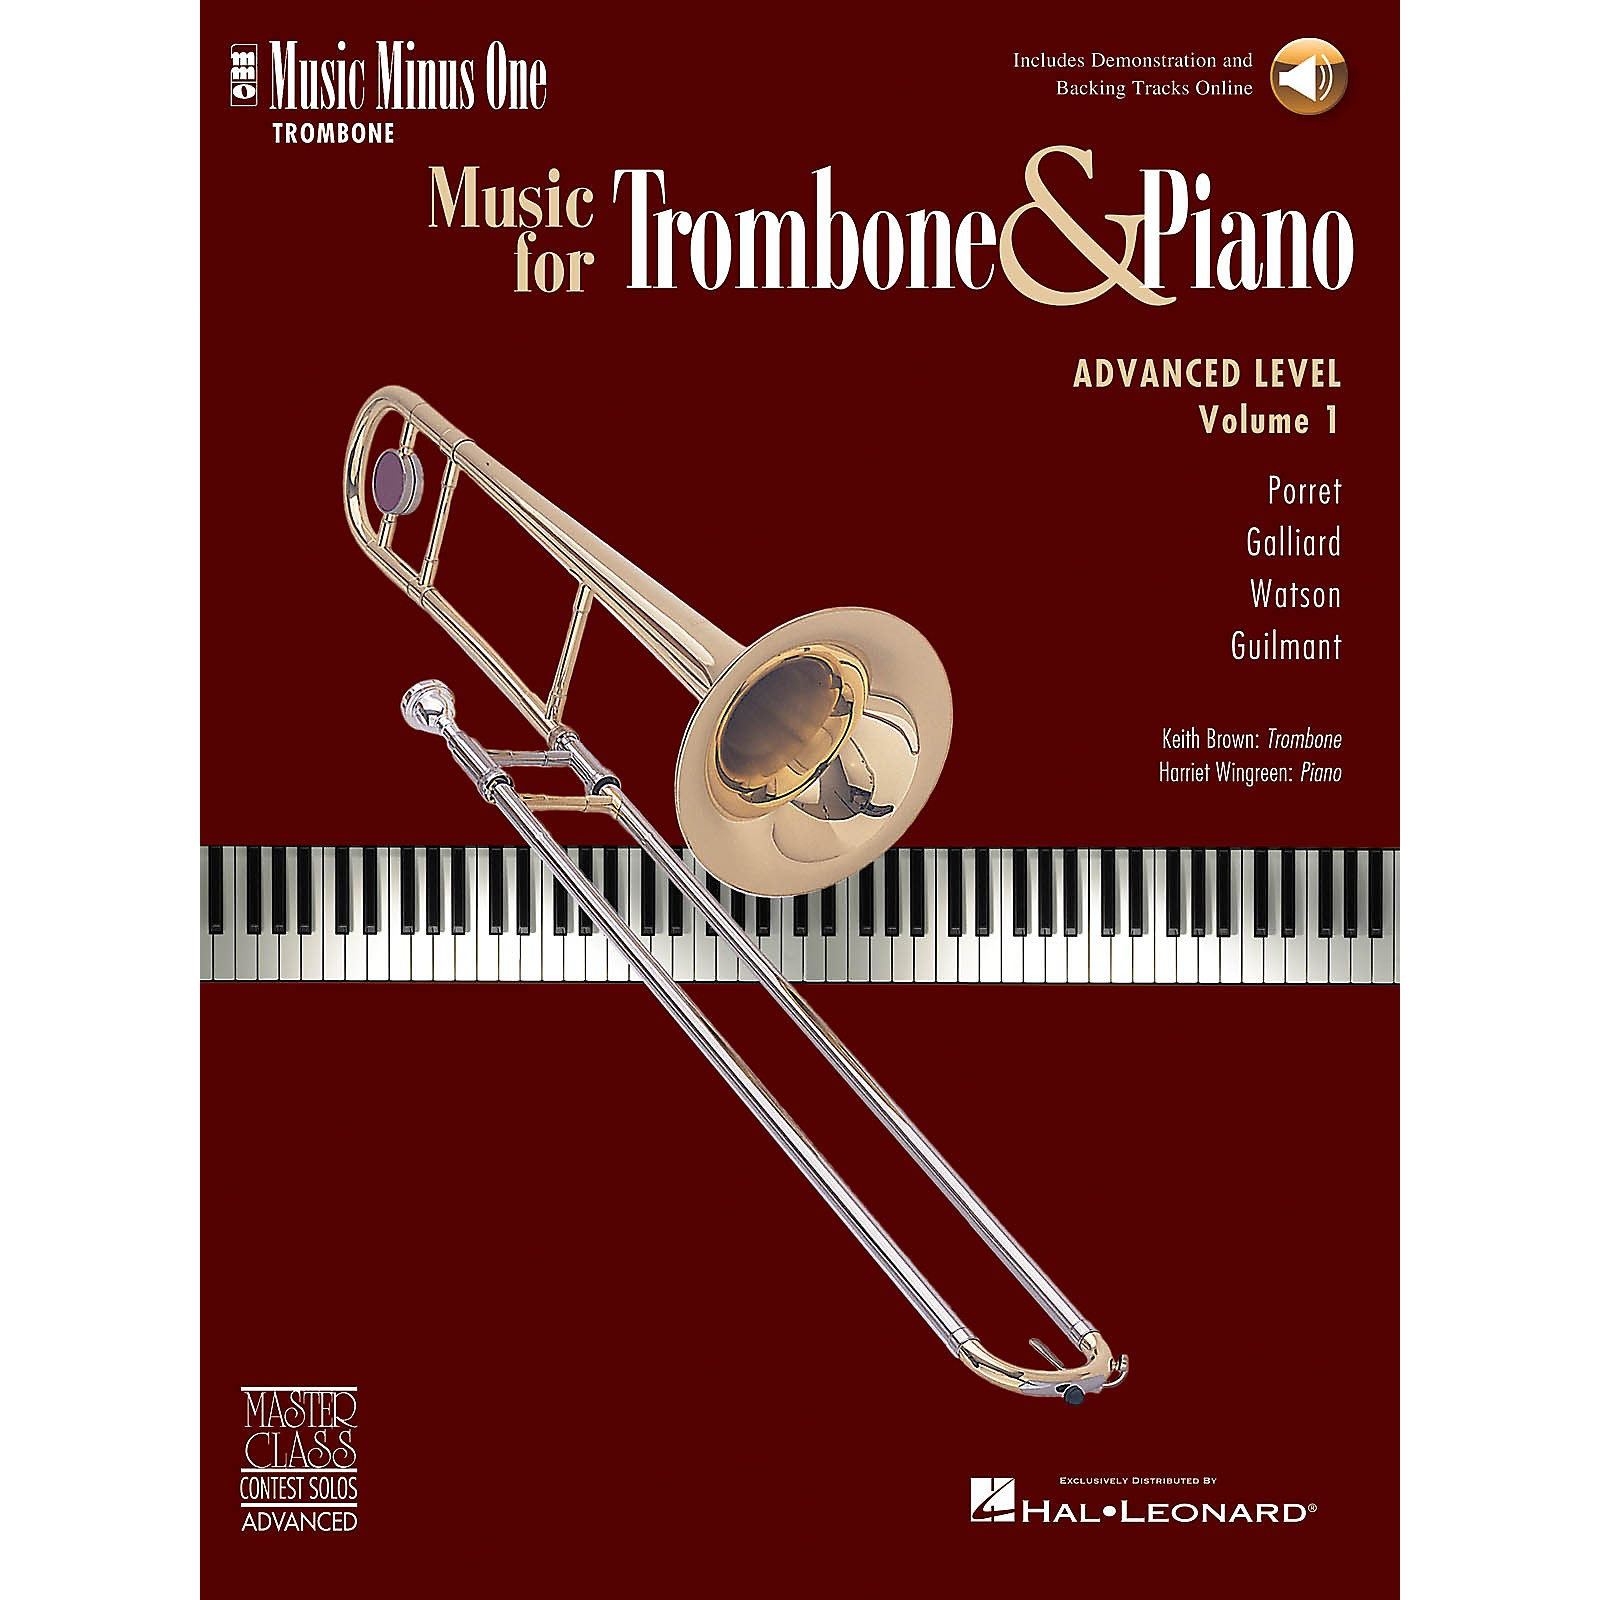 Music Minus One Advanced Trombone Solos, Volume 1 (for Trombone) Music Minus One Series Softcover with CD